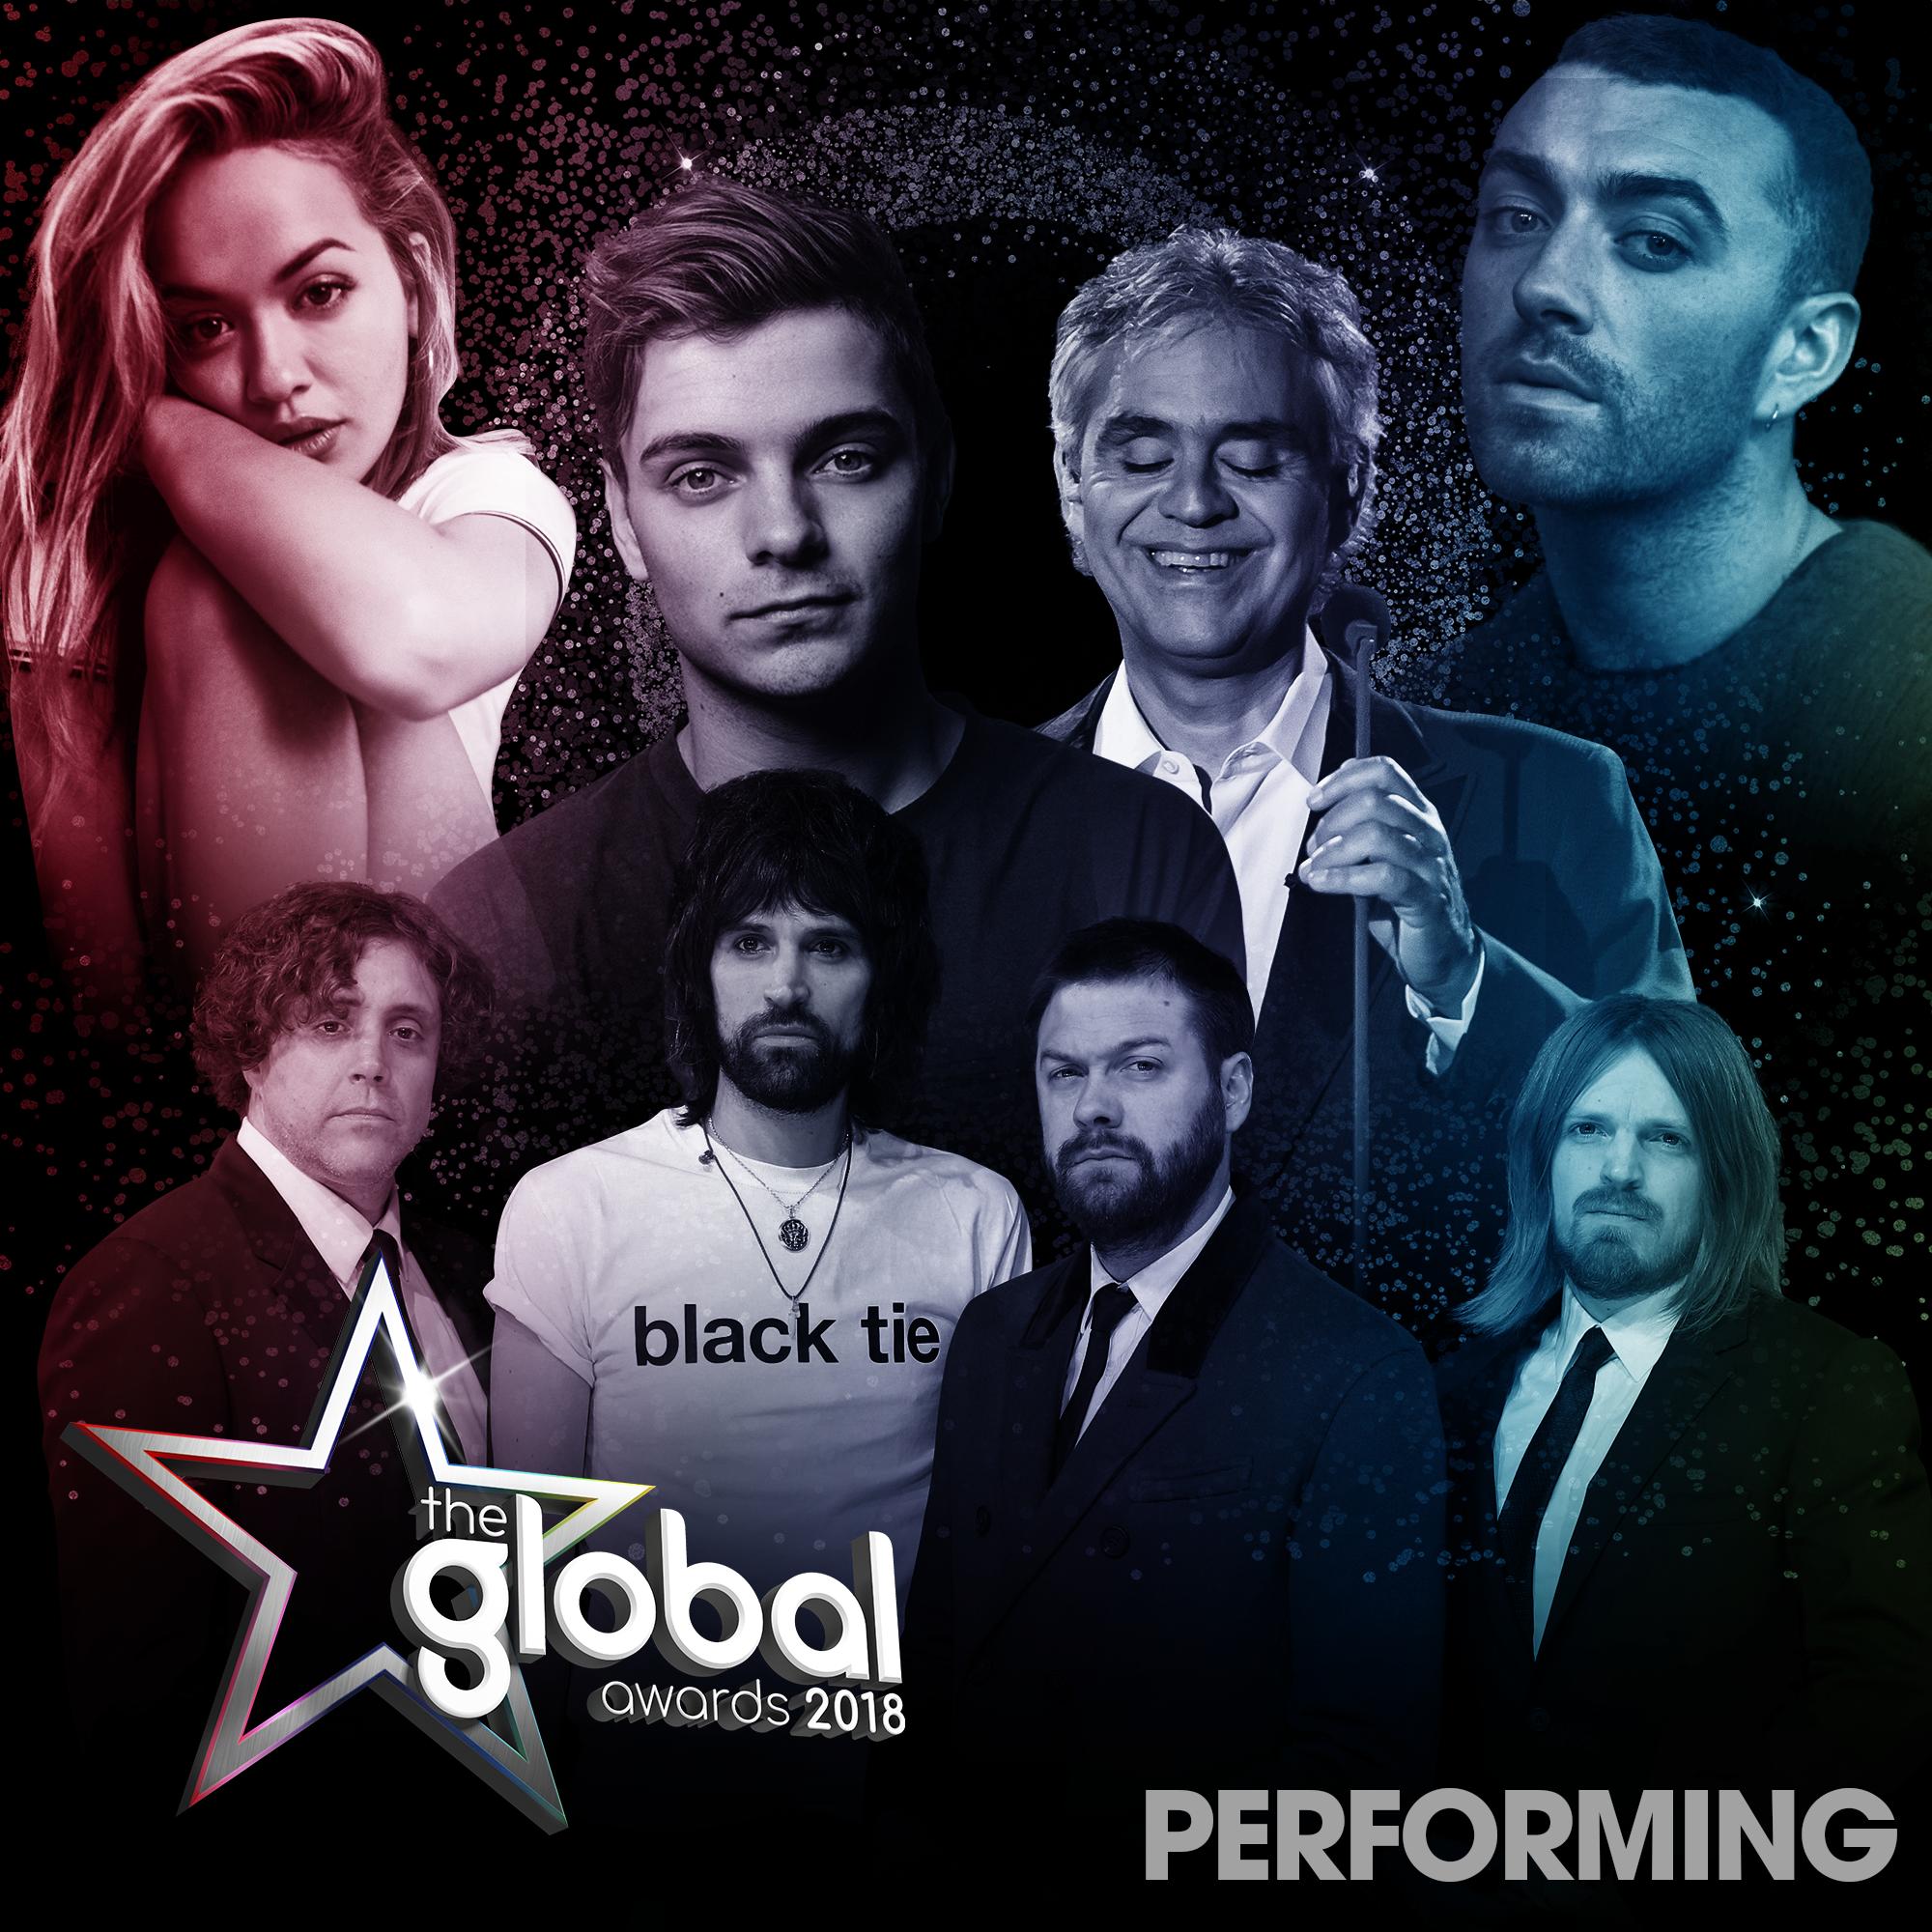 Global Awards 2018 Performers